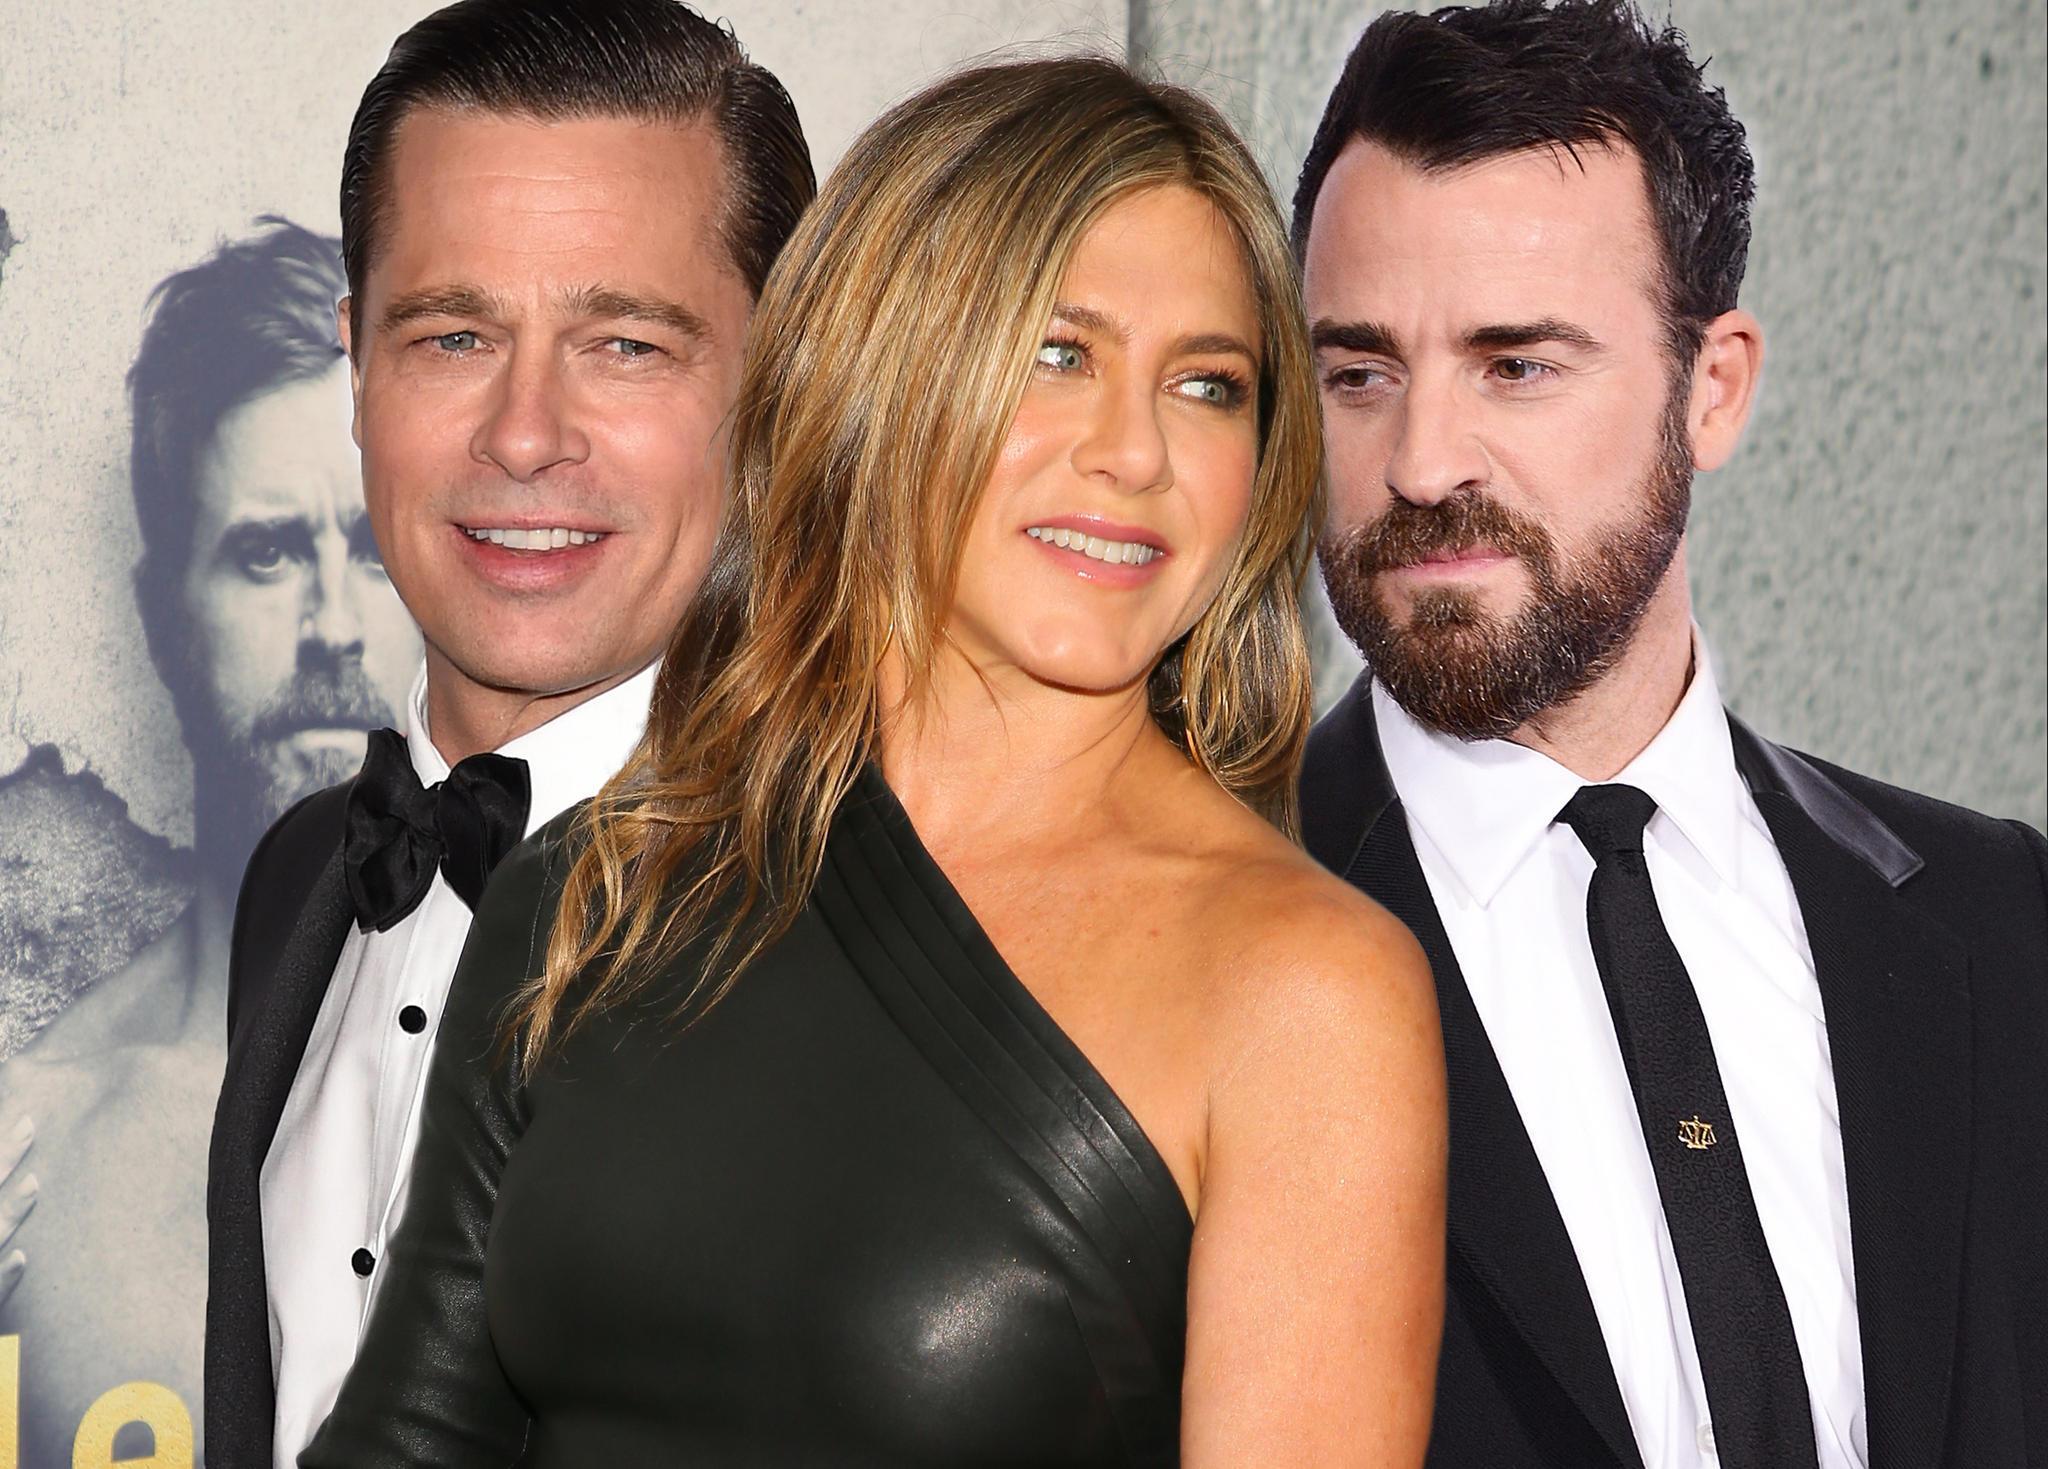 Jennifer Anistons 50. Geburtstag: Heftige Frau